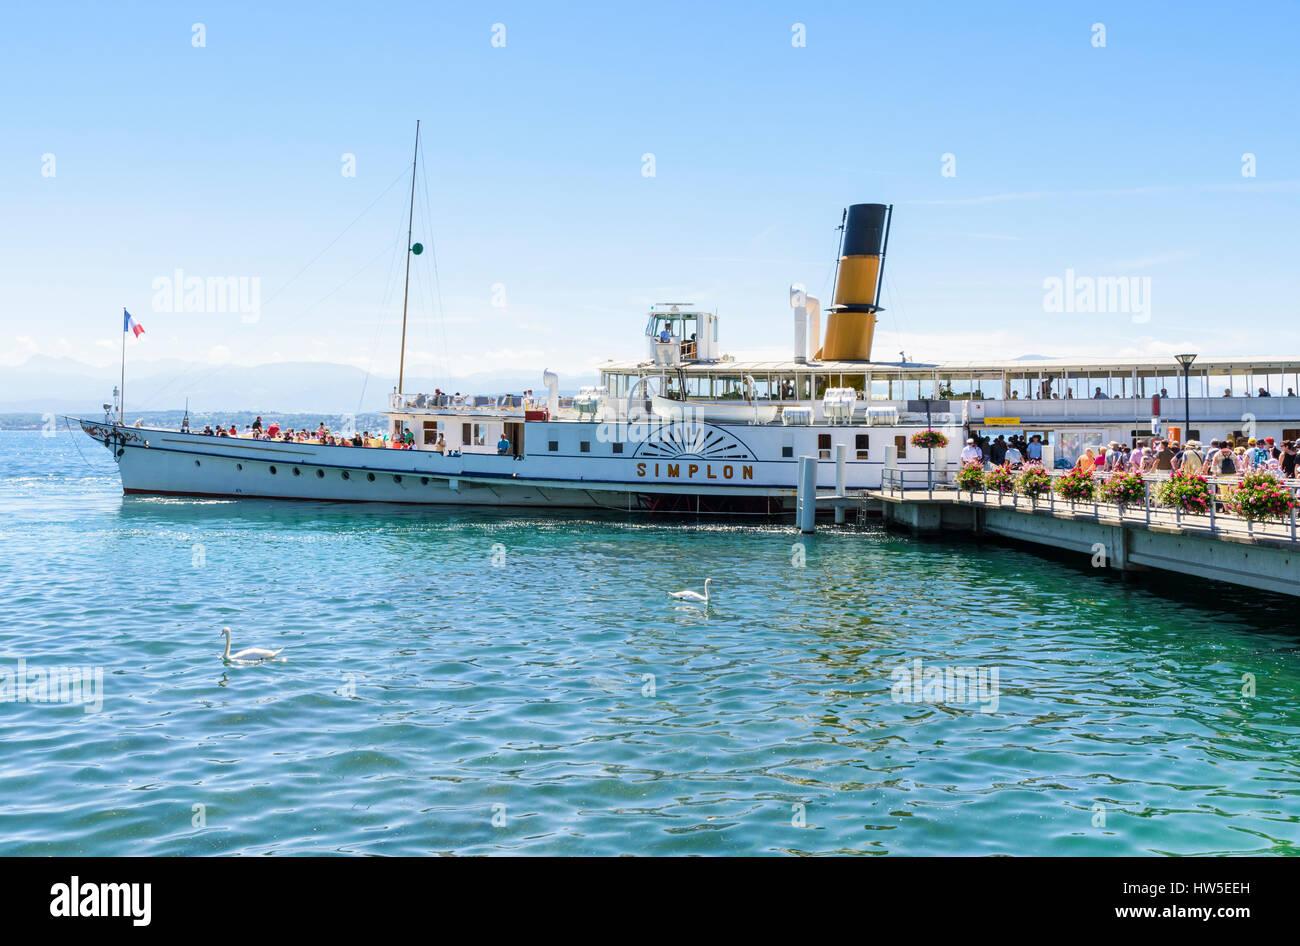 Passengers boarding a traditional Lake Geneva paddle steamer at the port of Nyon, Vaud, Switzerland - Stock Image